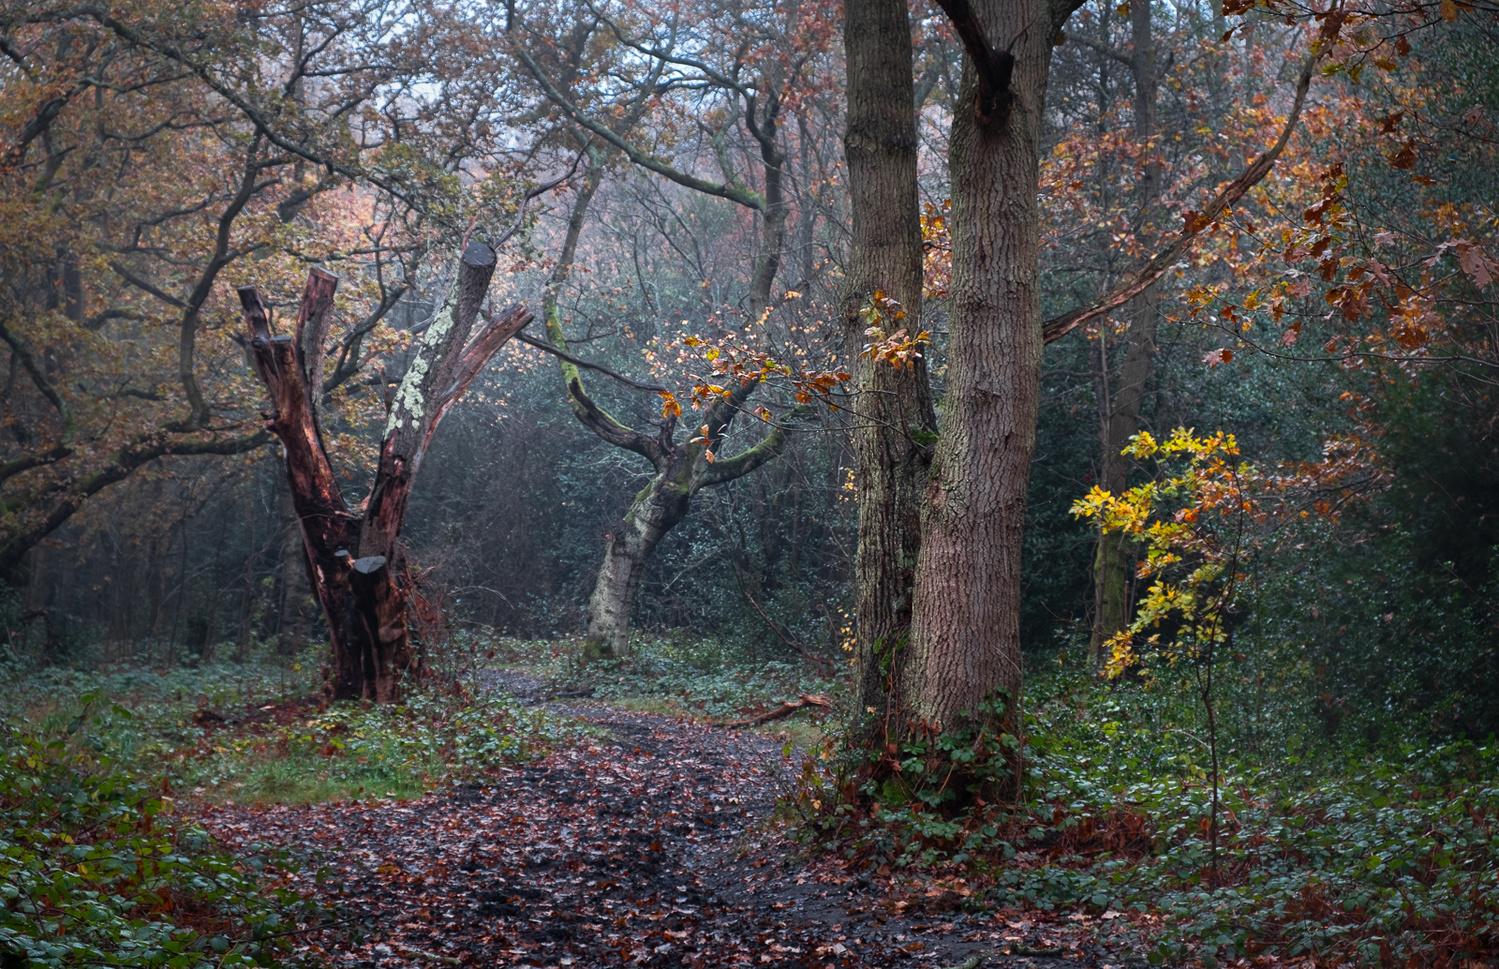 Dancers in the Woods by Julian Macedo